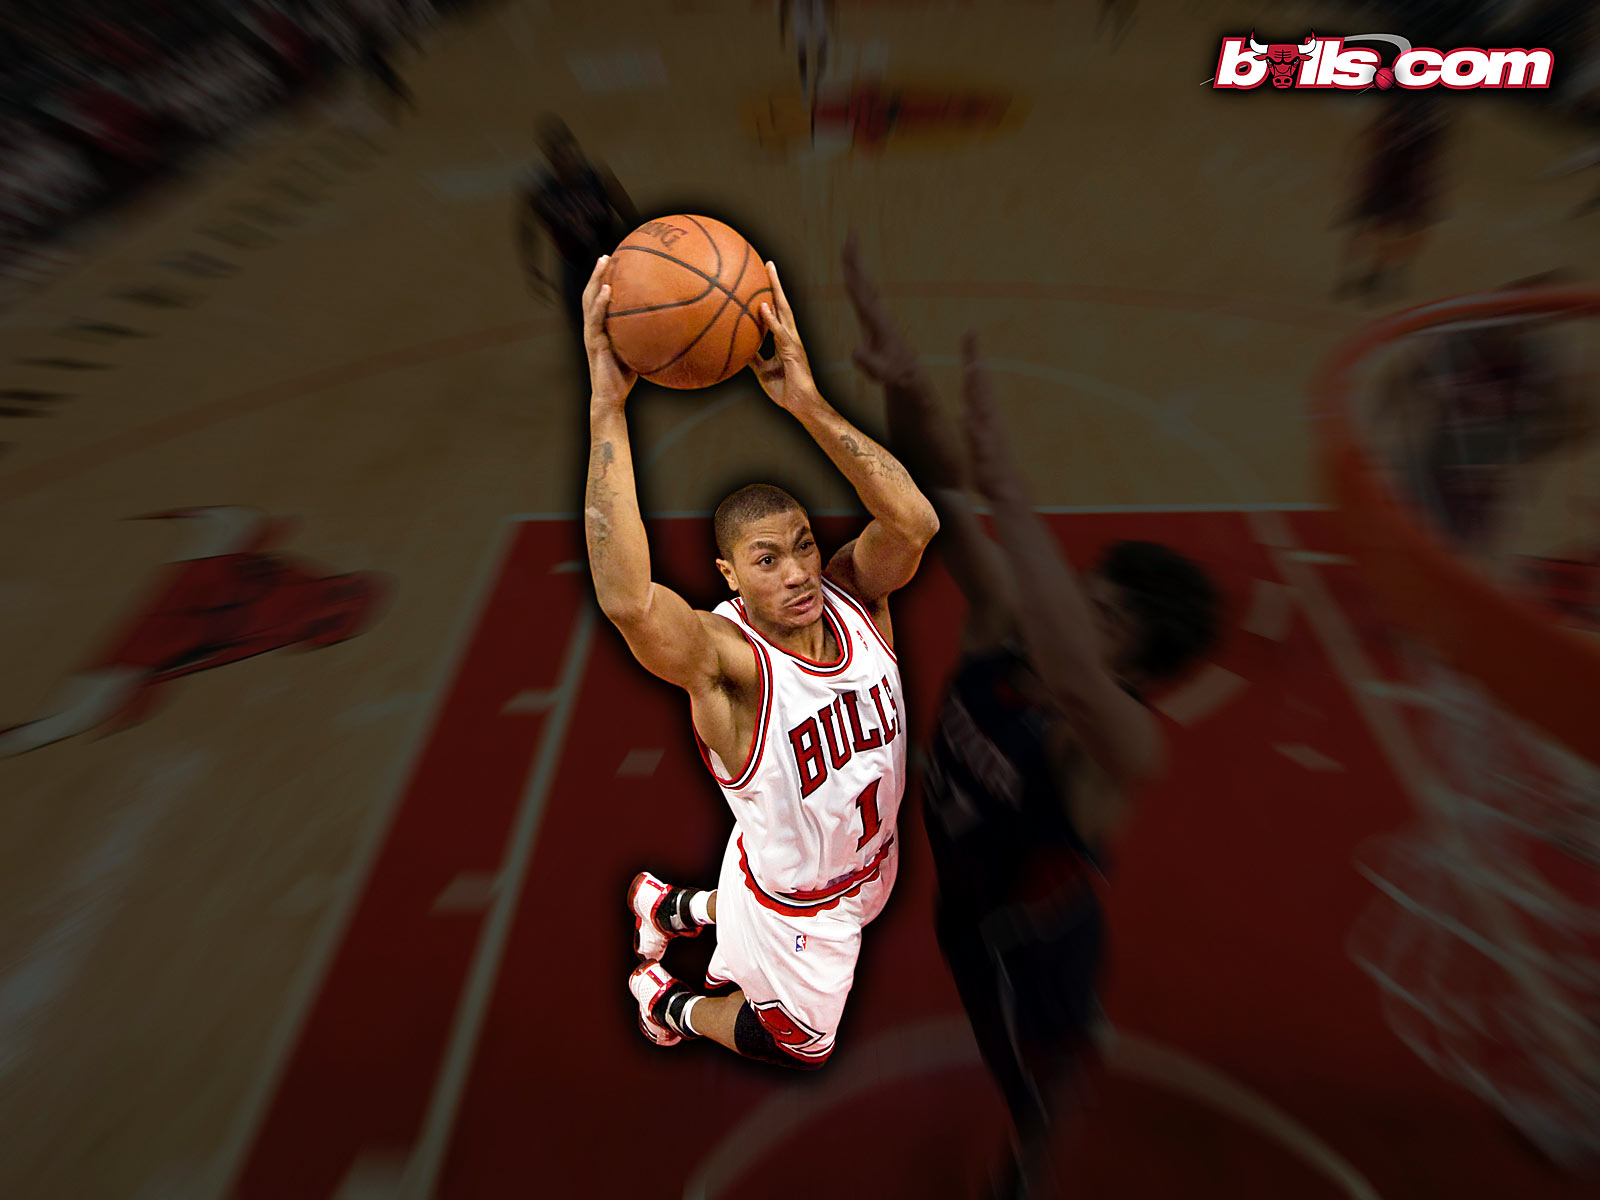 NBA Wallpapers Collection O Image Album